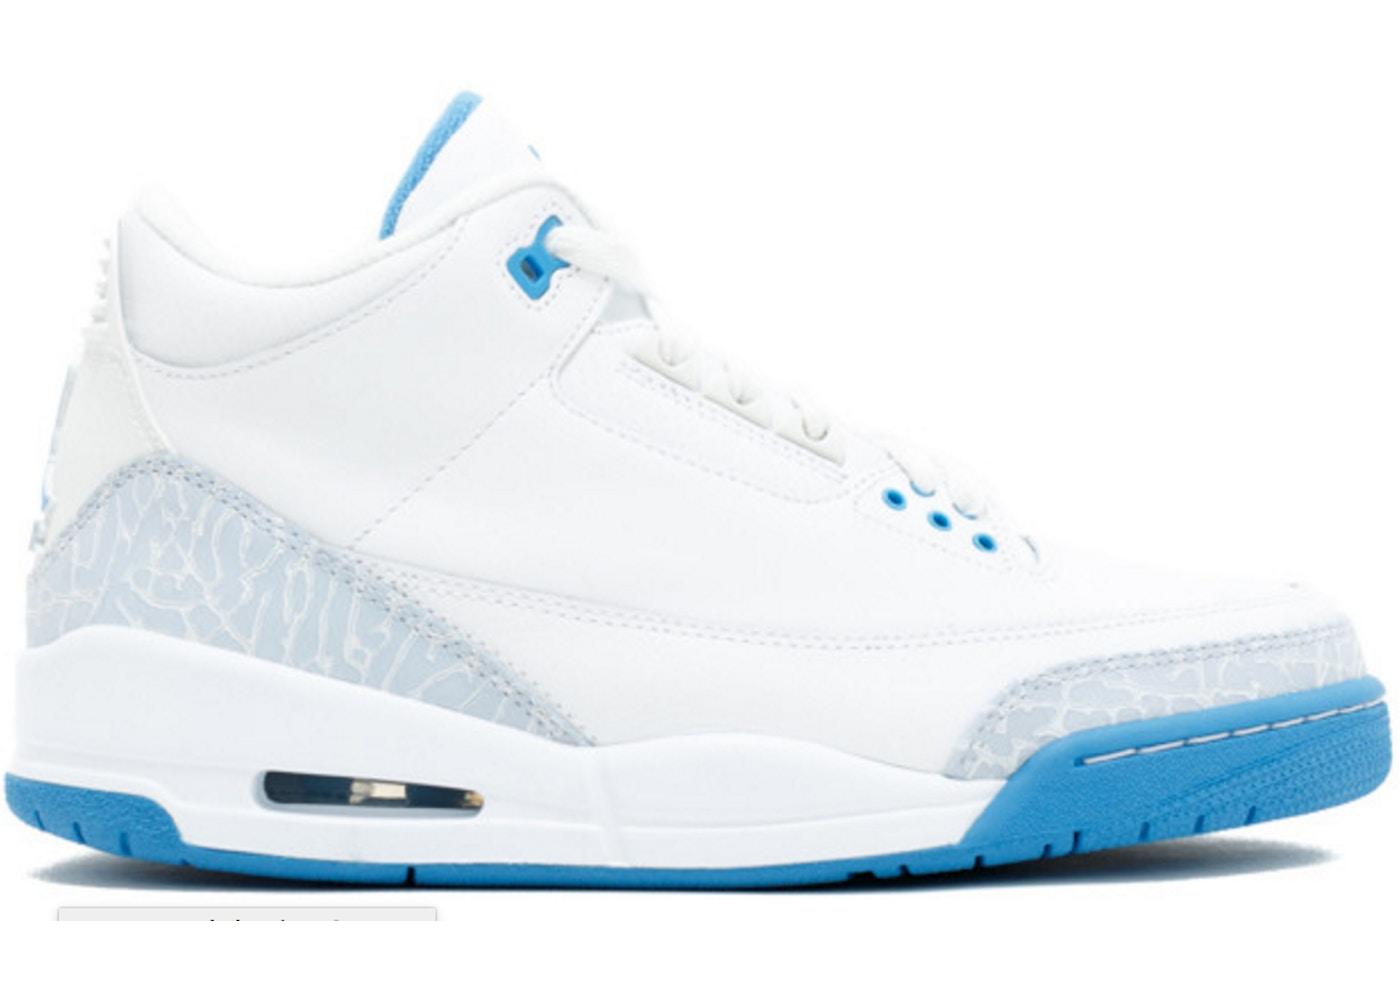 f0ff956b957e Jordan 3 Retro Harbor Blue (W) - 315296-142